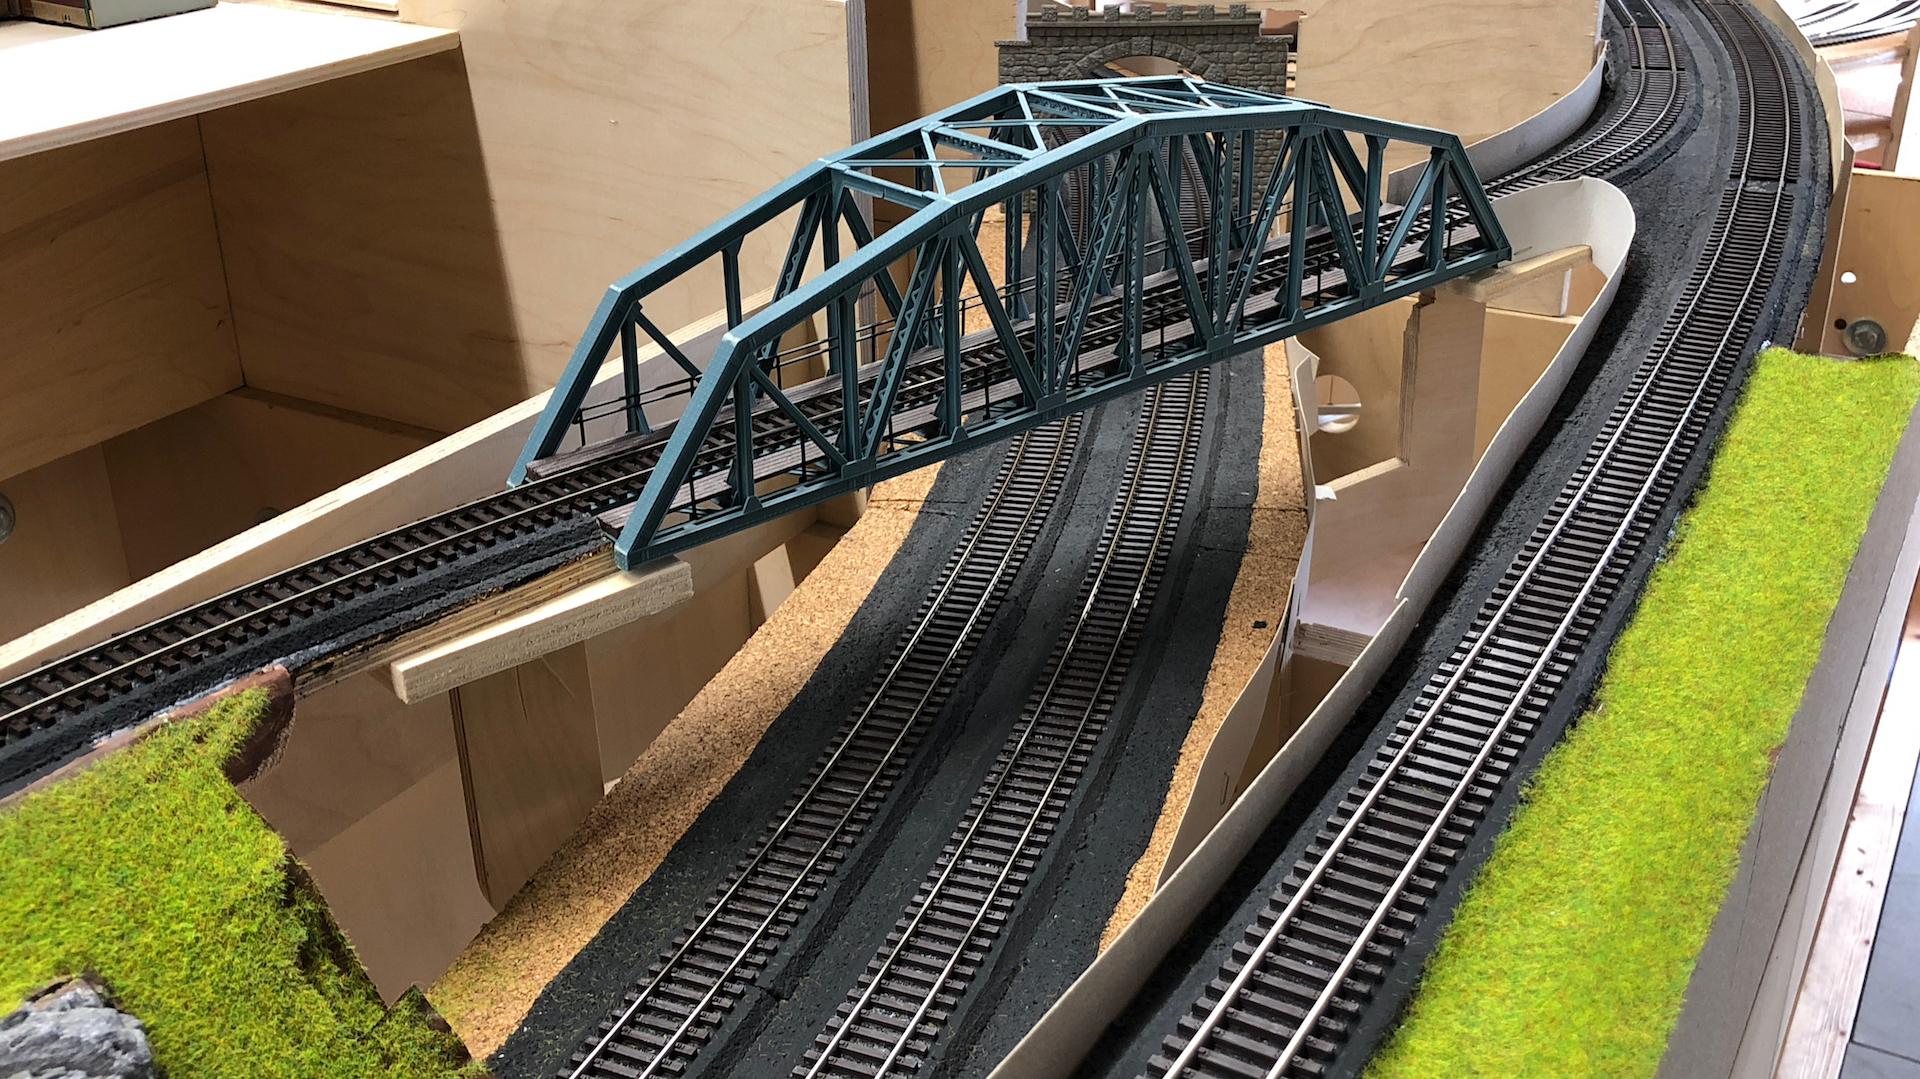 18_02_24_Schautag-Eisenbahnfreunde-Hameln_018